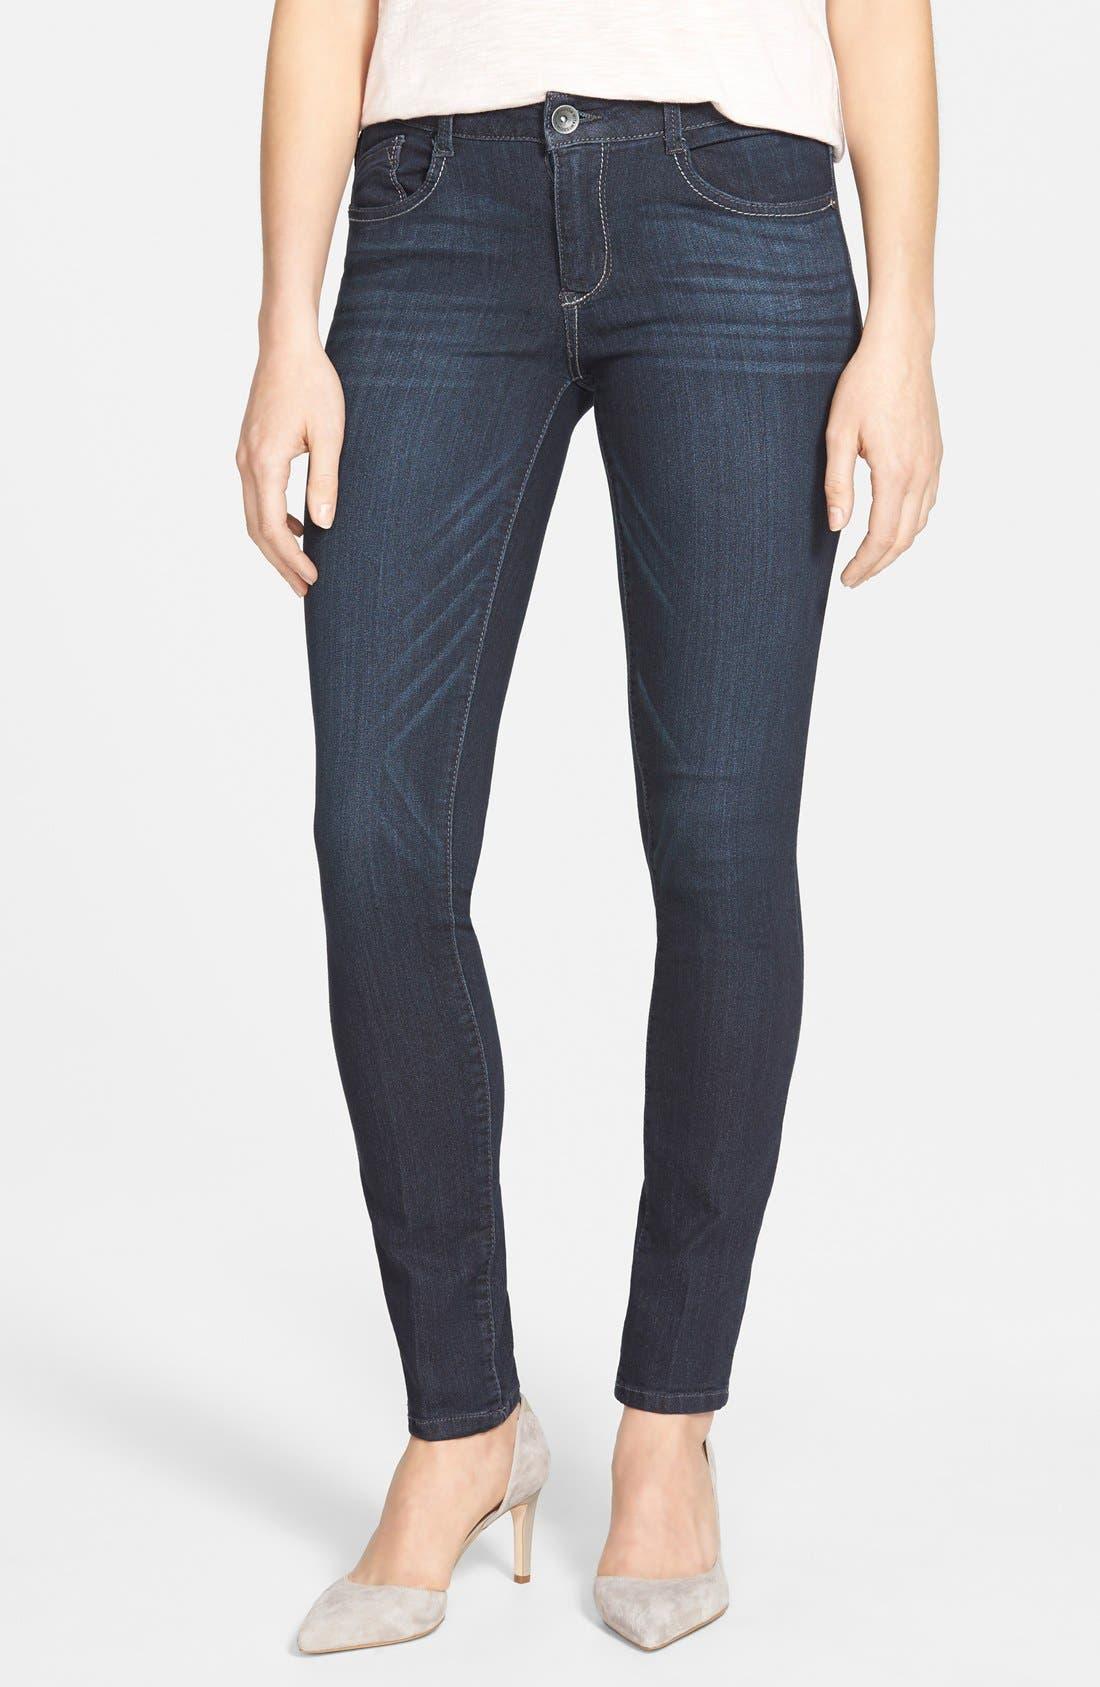 Alternate Image 1 Selected - Wit & Wisdom Super Smooth Stretch Denim Skinny Jeans (Dark Navy) (Regular & Petite) (Nordstrom Exclusive)